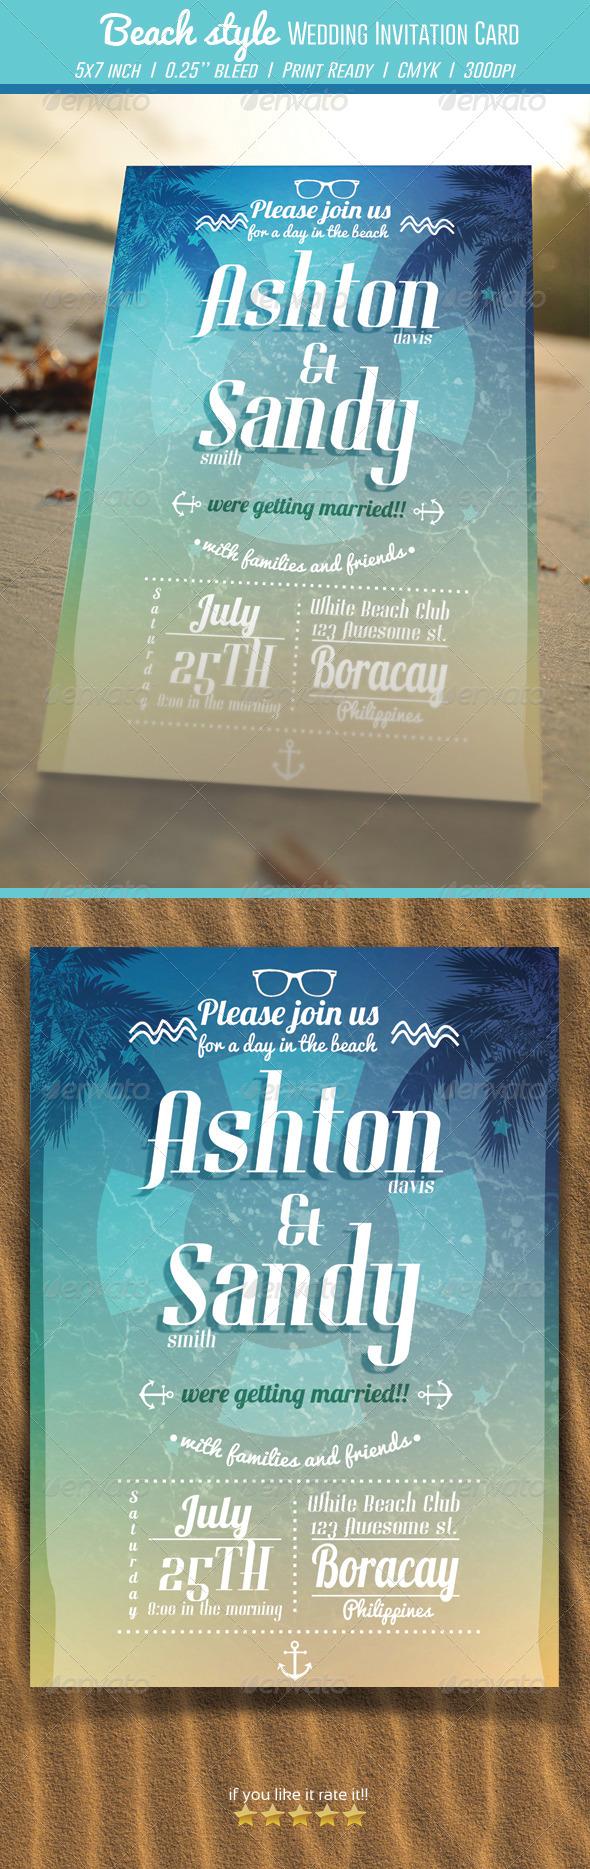 GraphicRiver Beach Style Wedding Invitation Card 6978646